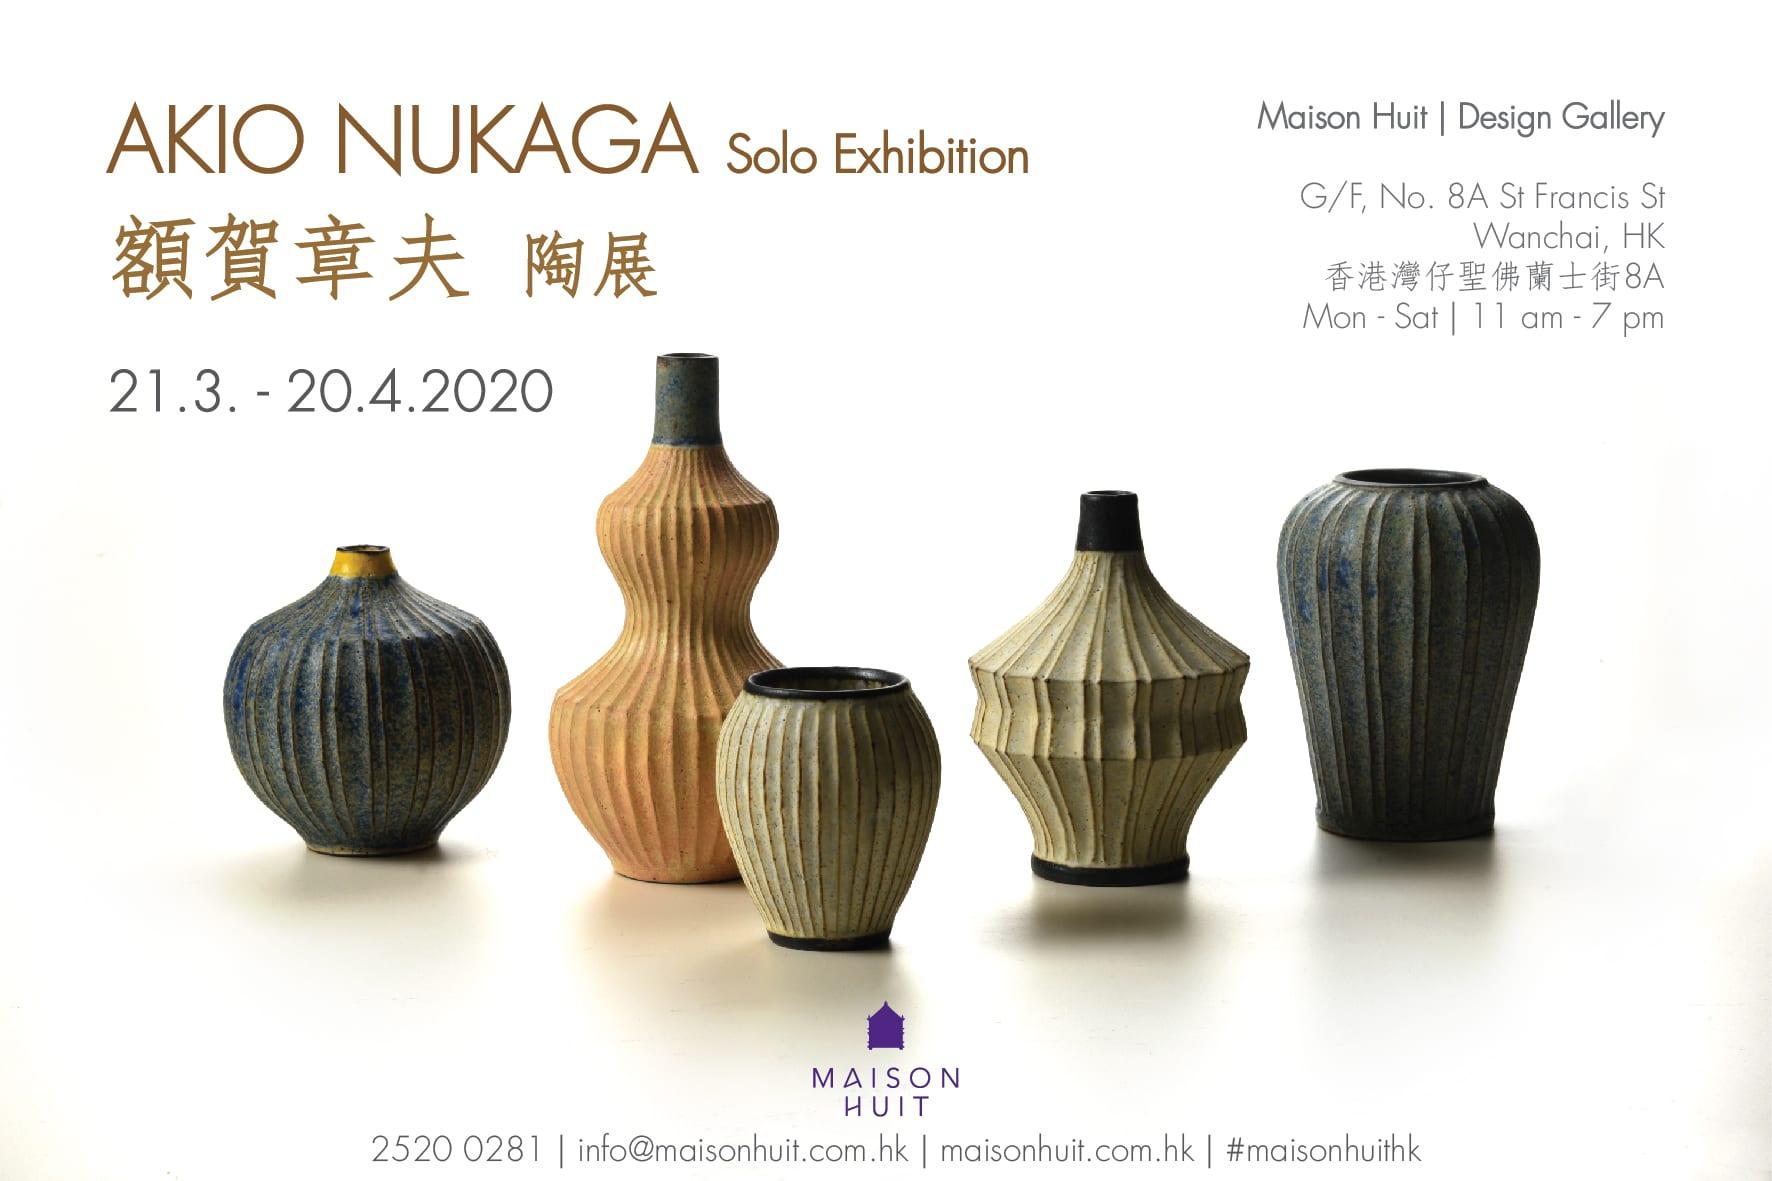 Exhibition | Japanese Ceramics by Akio Nukaga